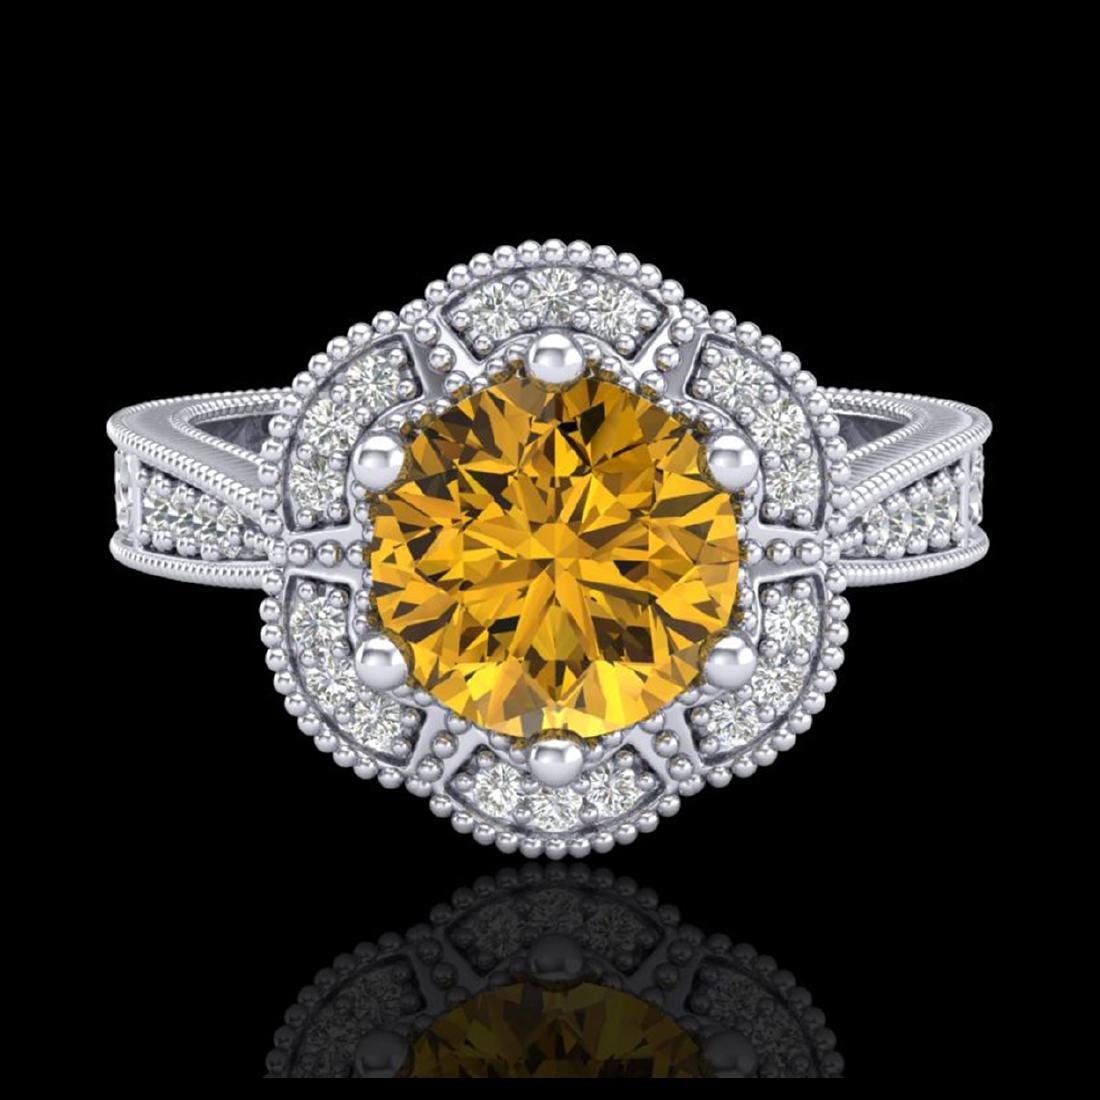 1.33 CTW Intense Fancy Yellow Diamond Engagement Art - 2